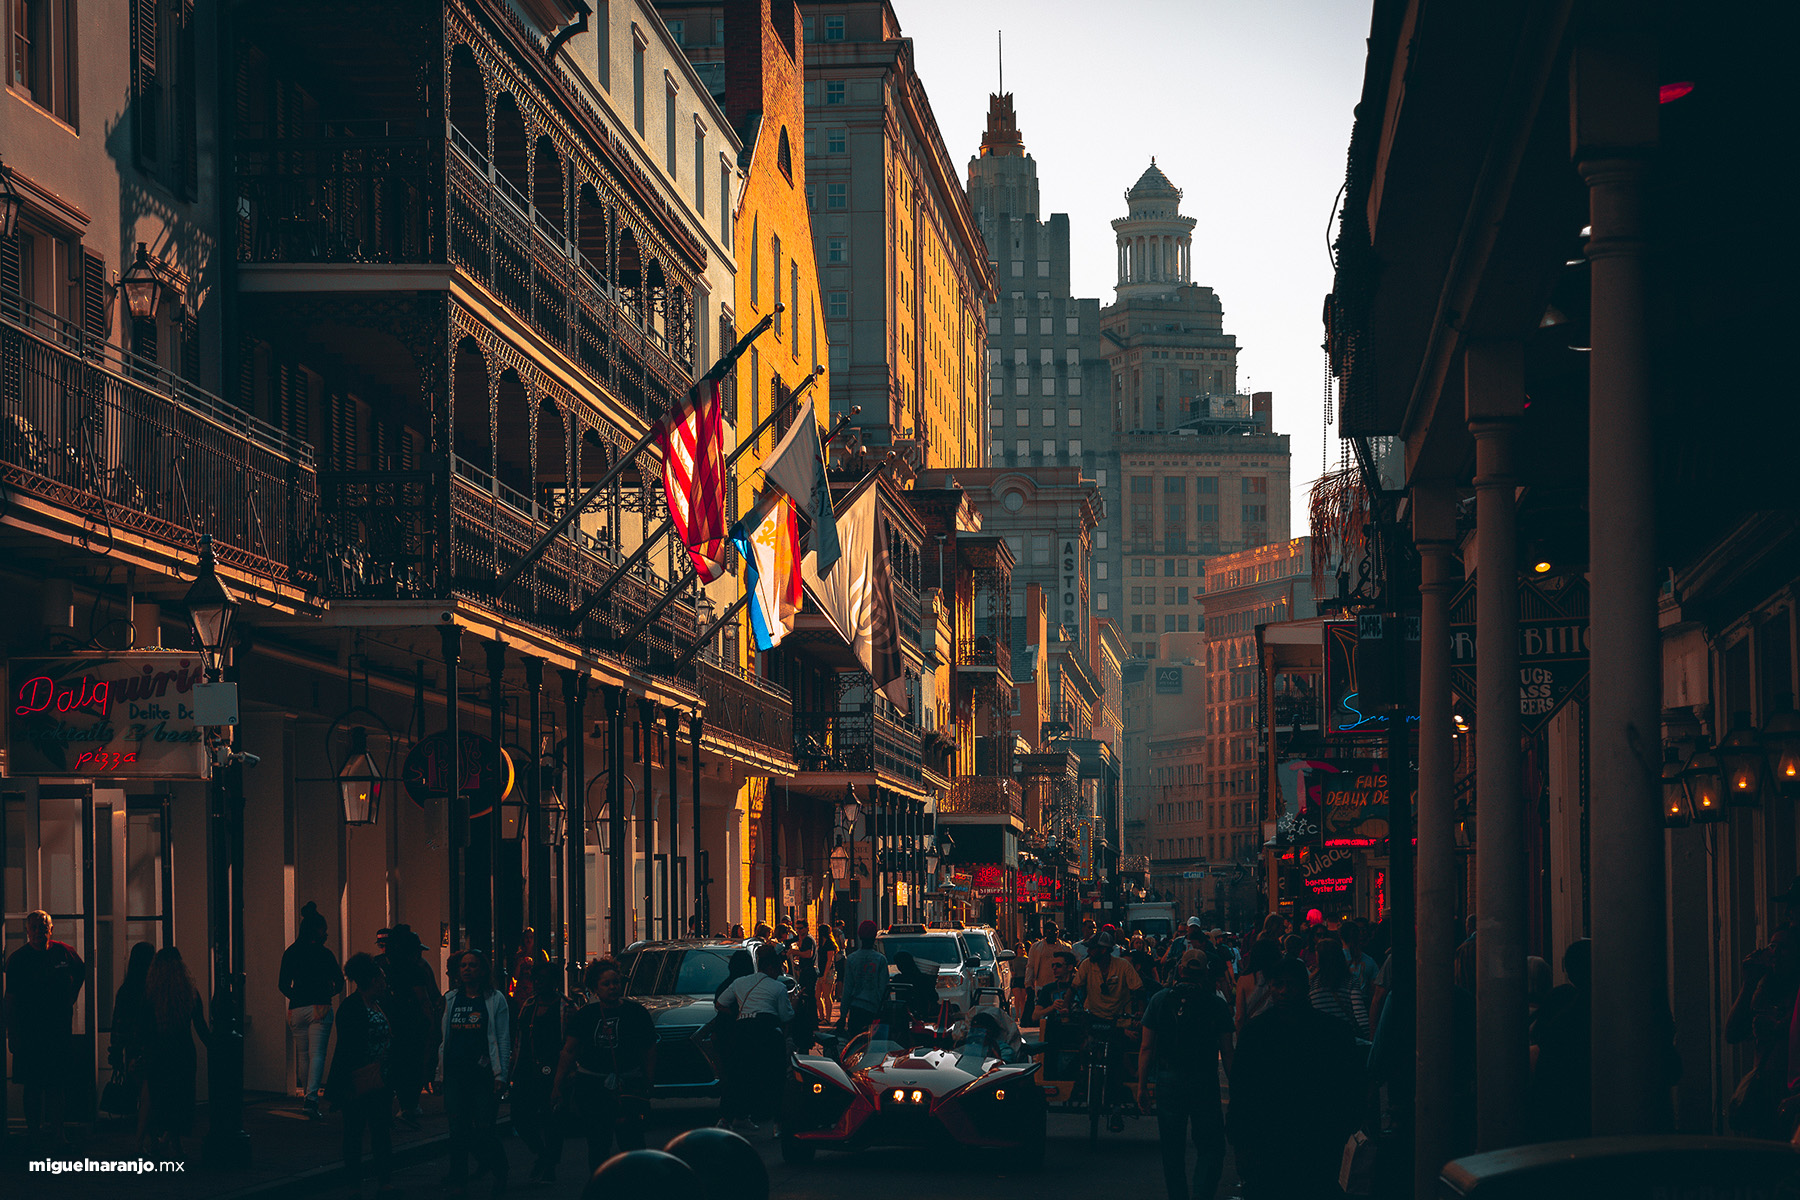 Bourbon Sr, New Orleans